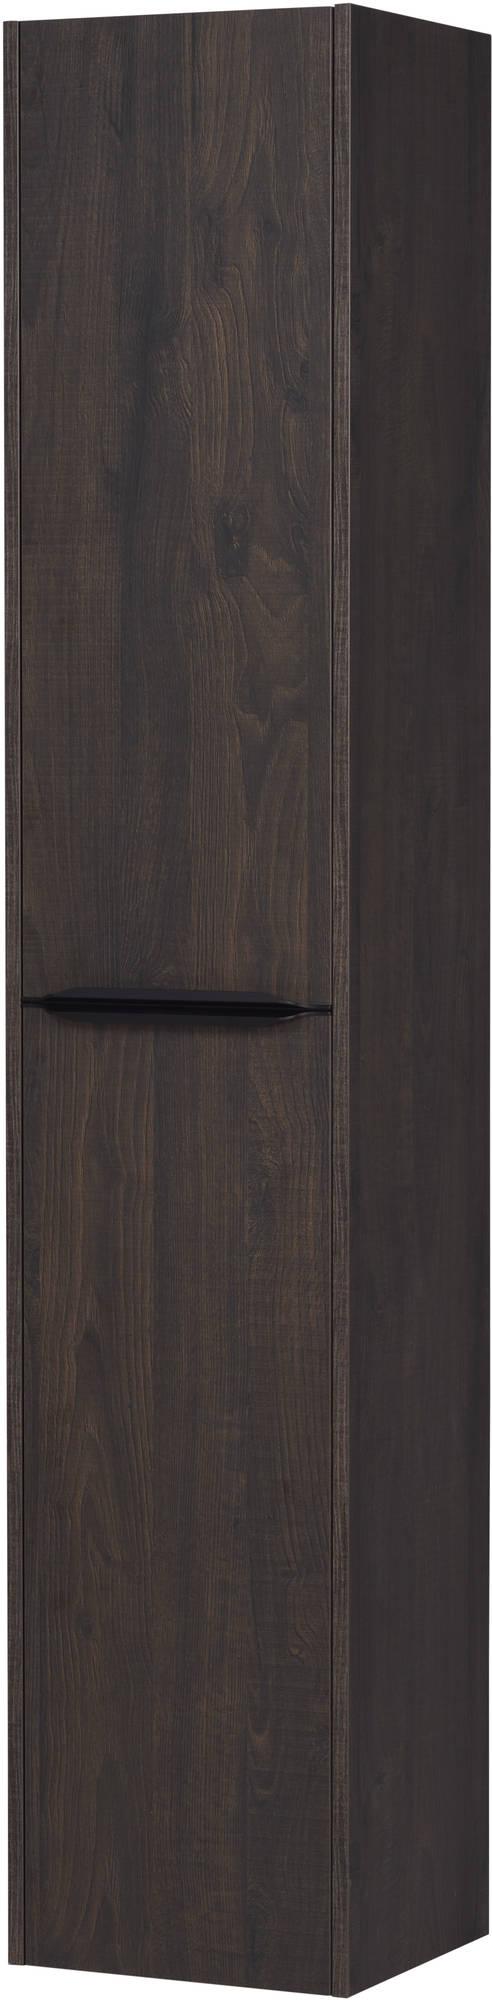 Saniselect Socan Hoge kast 35x32x180 cm Kasteel Bruin